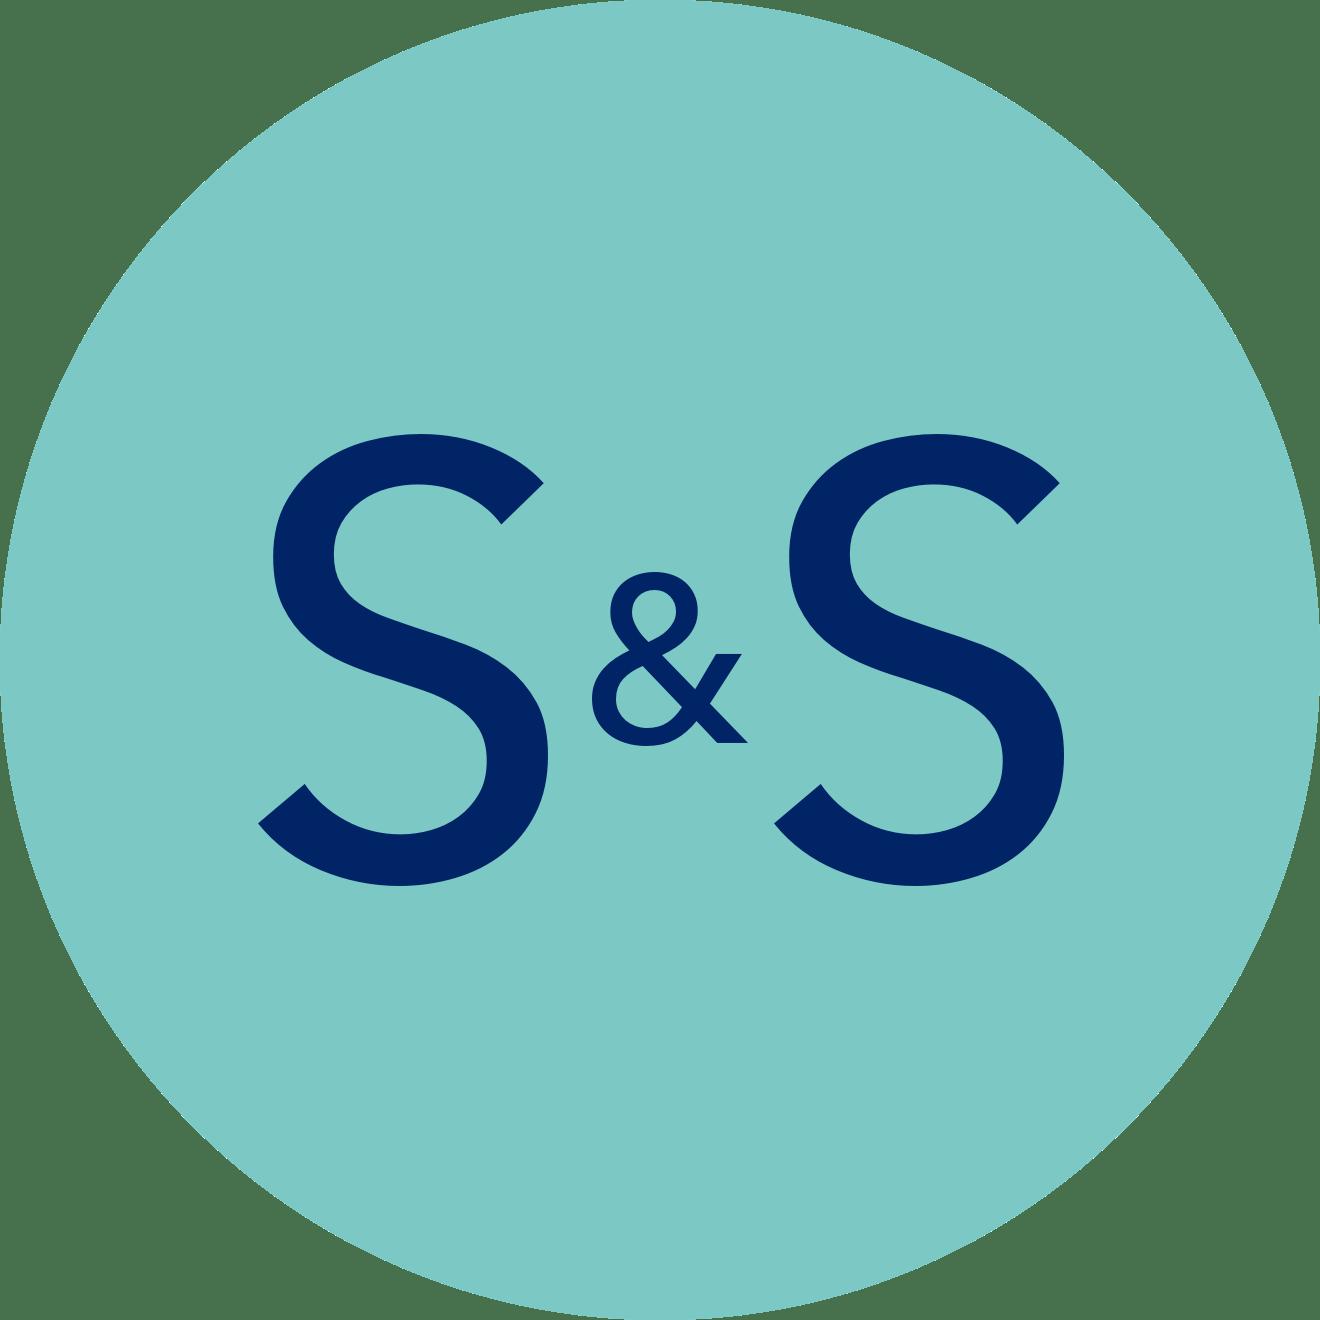 Samples & savings icon